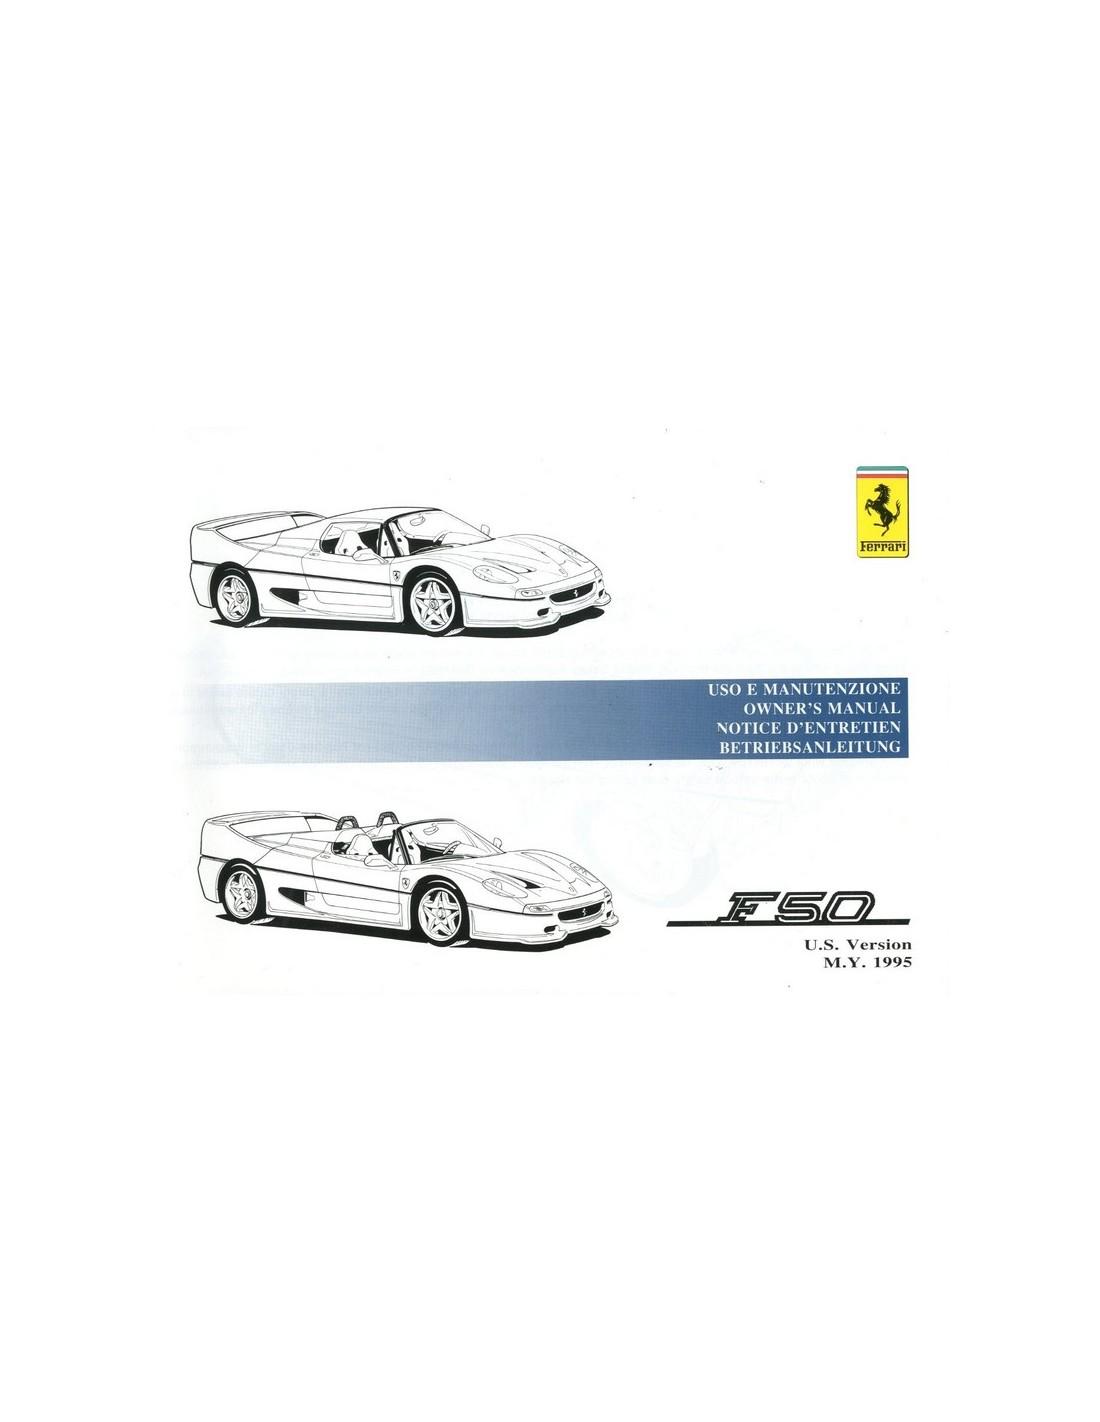 Ferrari Repair Manuals: 1995 FERRARI F50 OWNERS MANUAL HANDBOOK US 993/95